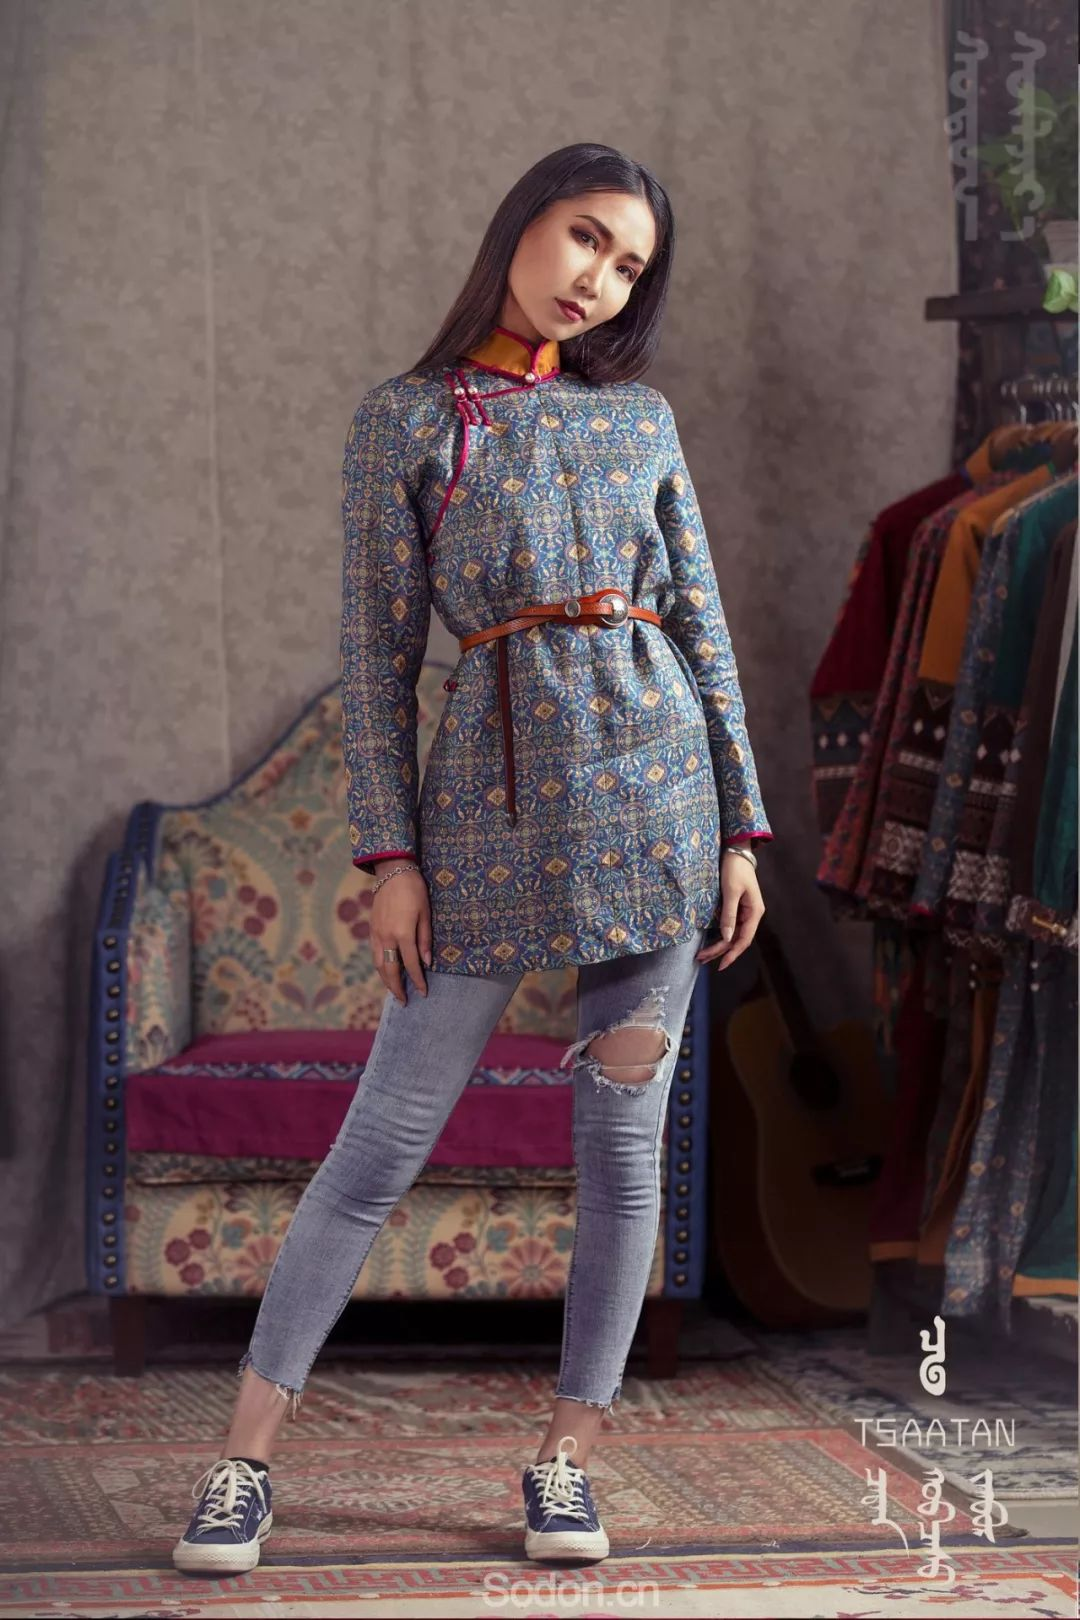 TSAATAN蒙古时装 2019夏季新款首发 第20张